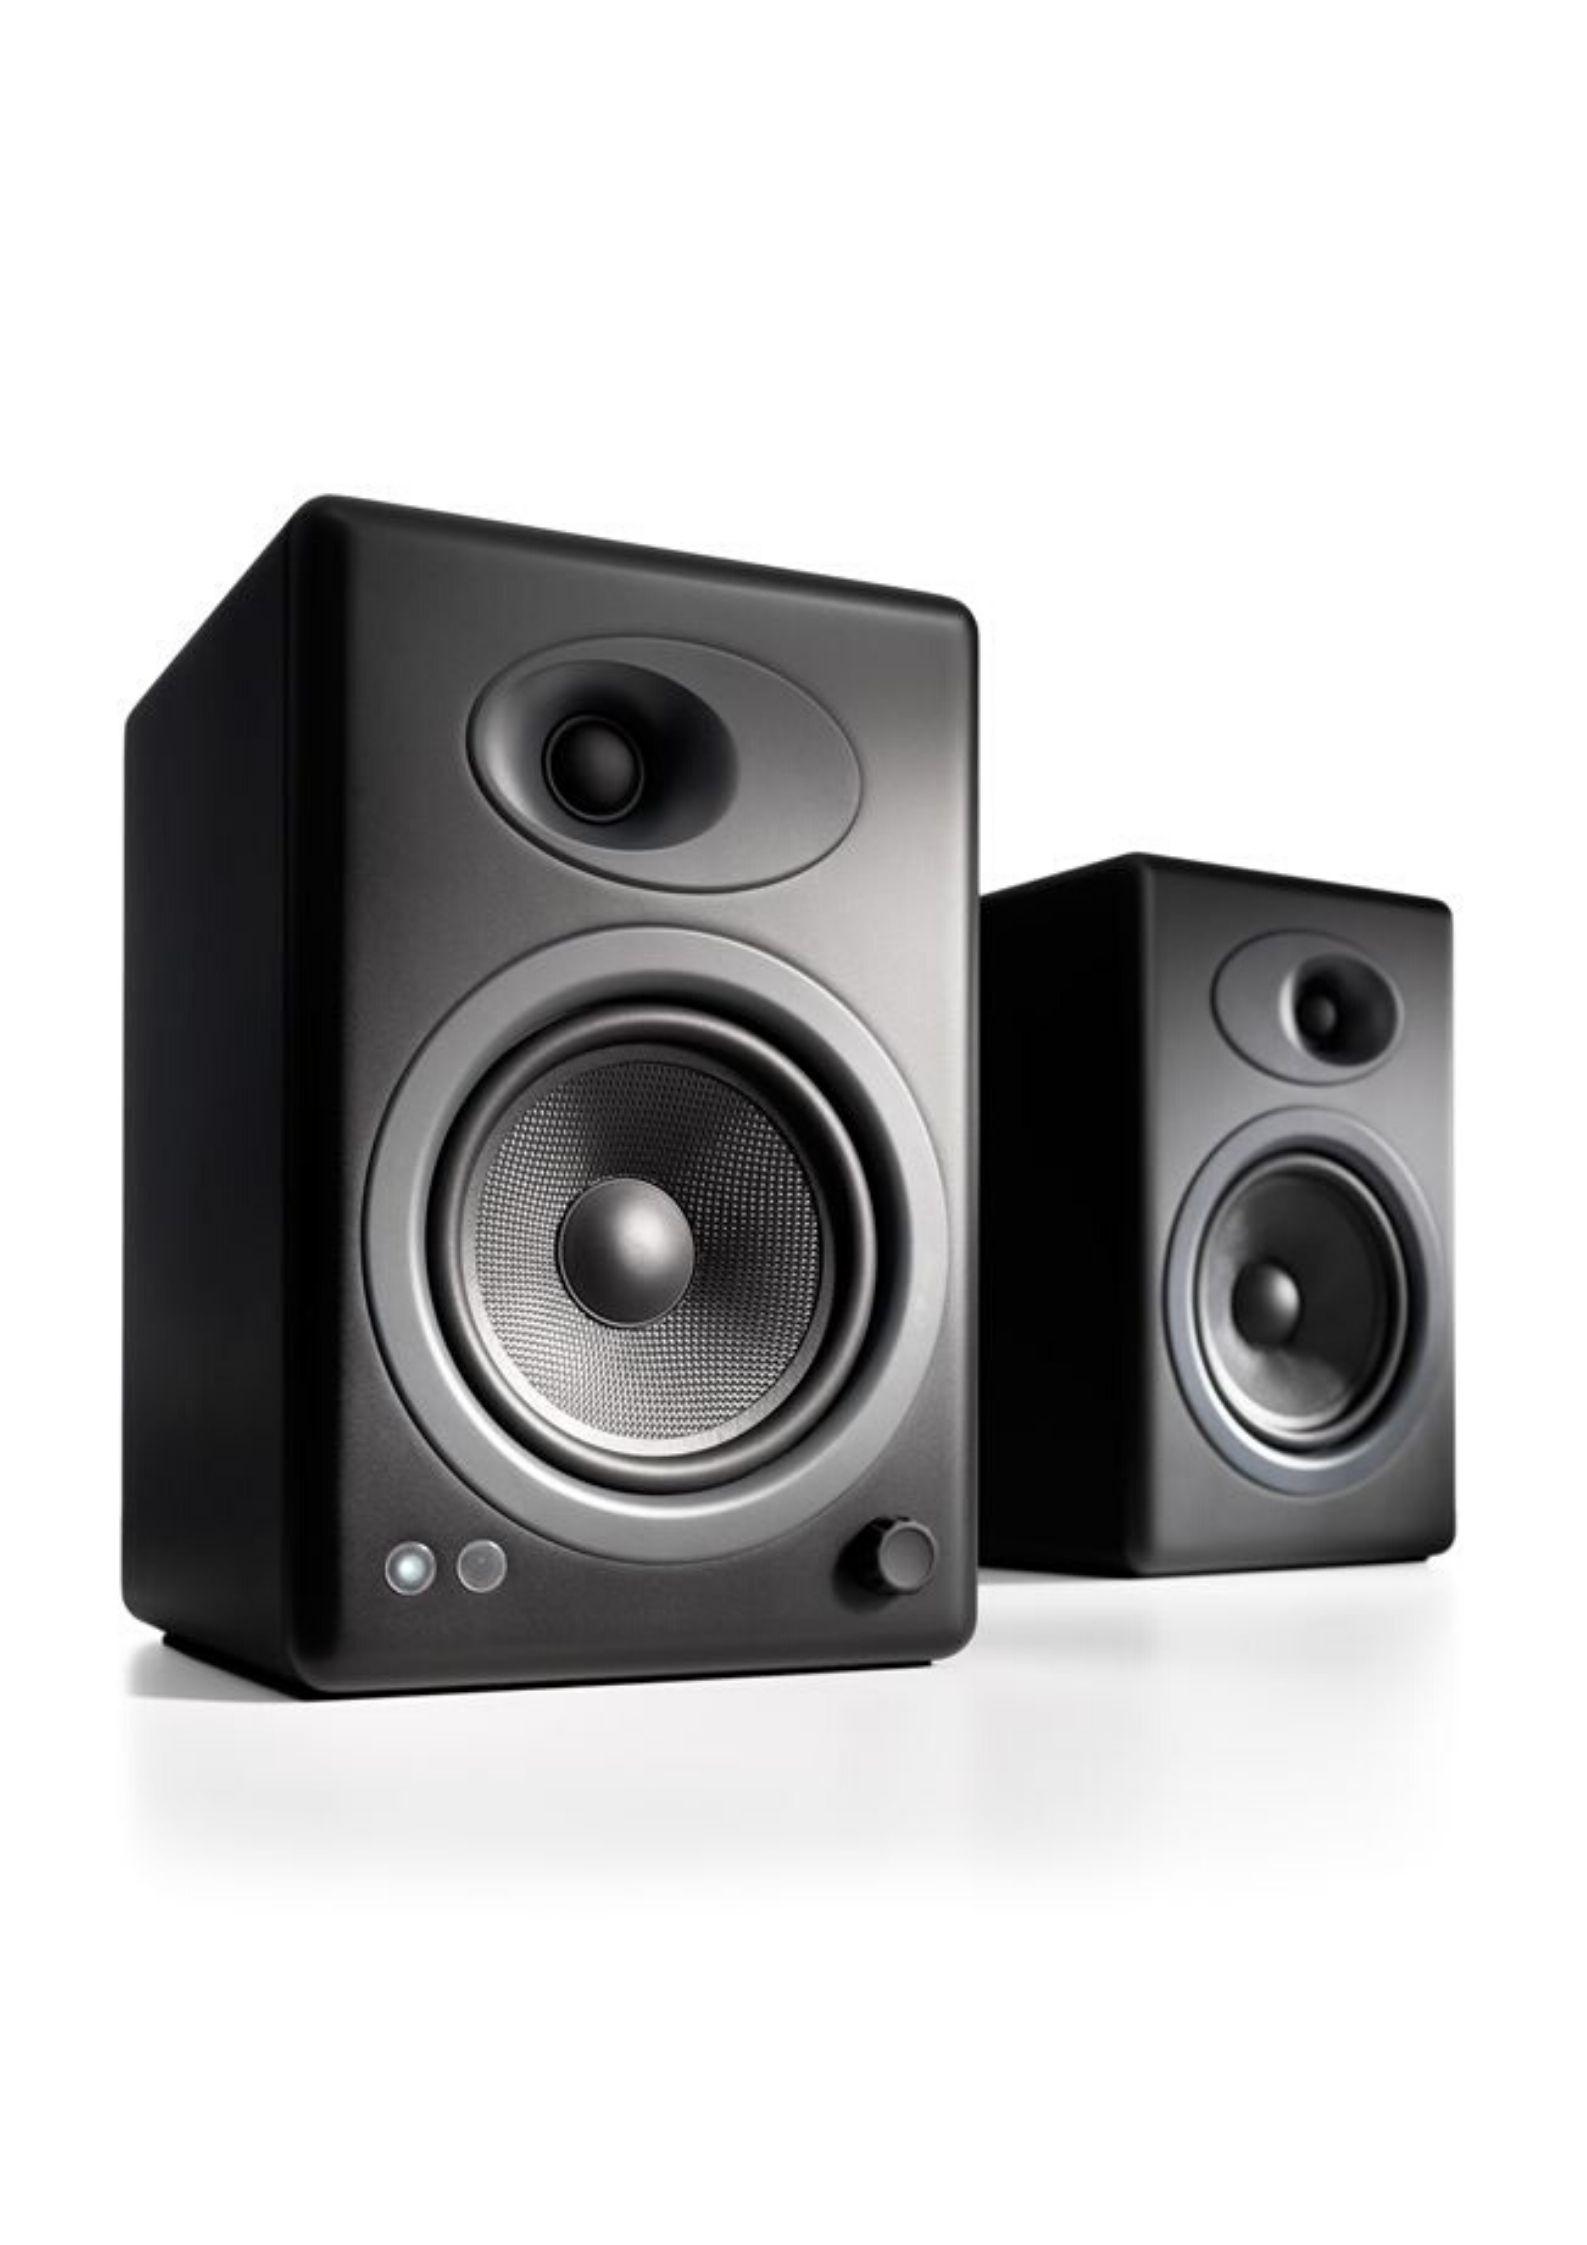 Audioengine A5+ Αυτοενισχυόμενα Ηχεία Υπολογιστή Black